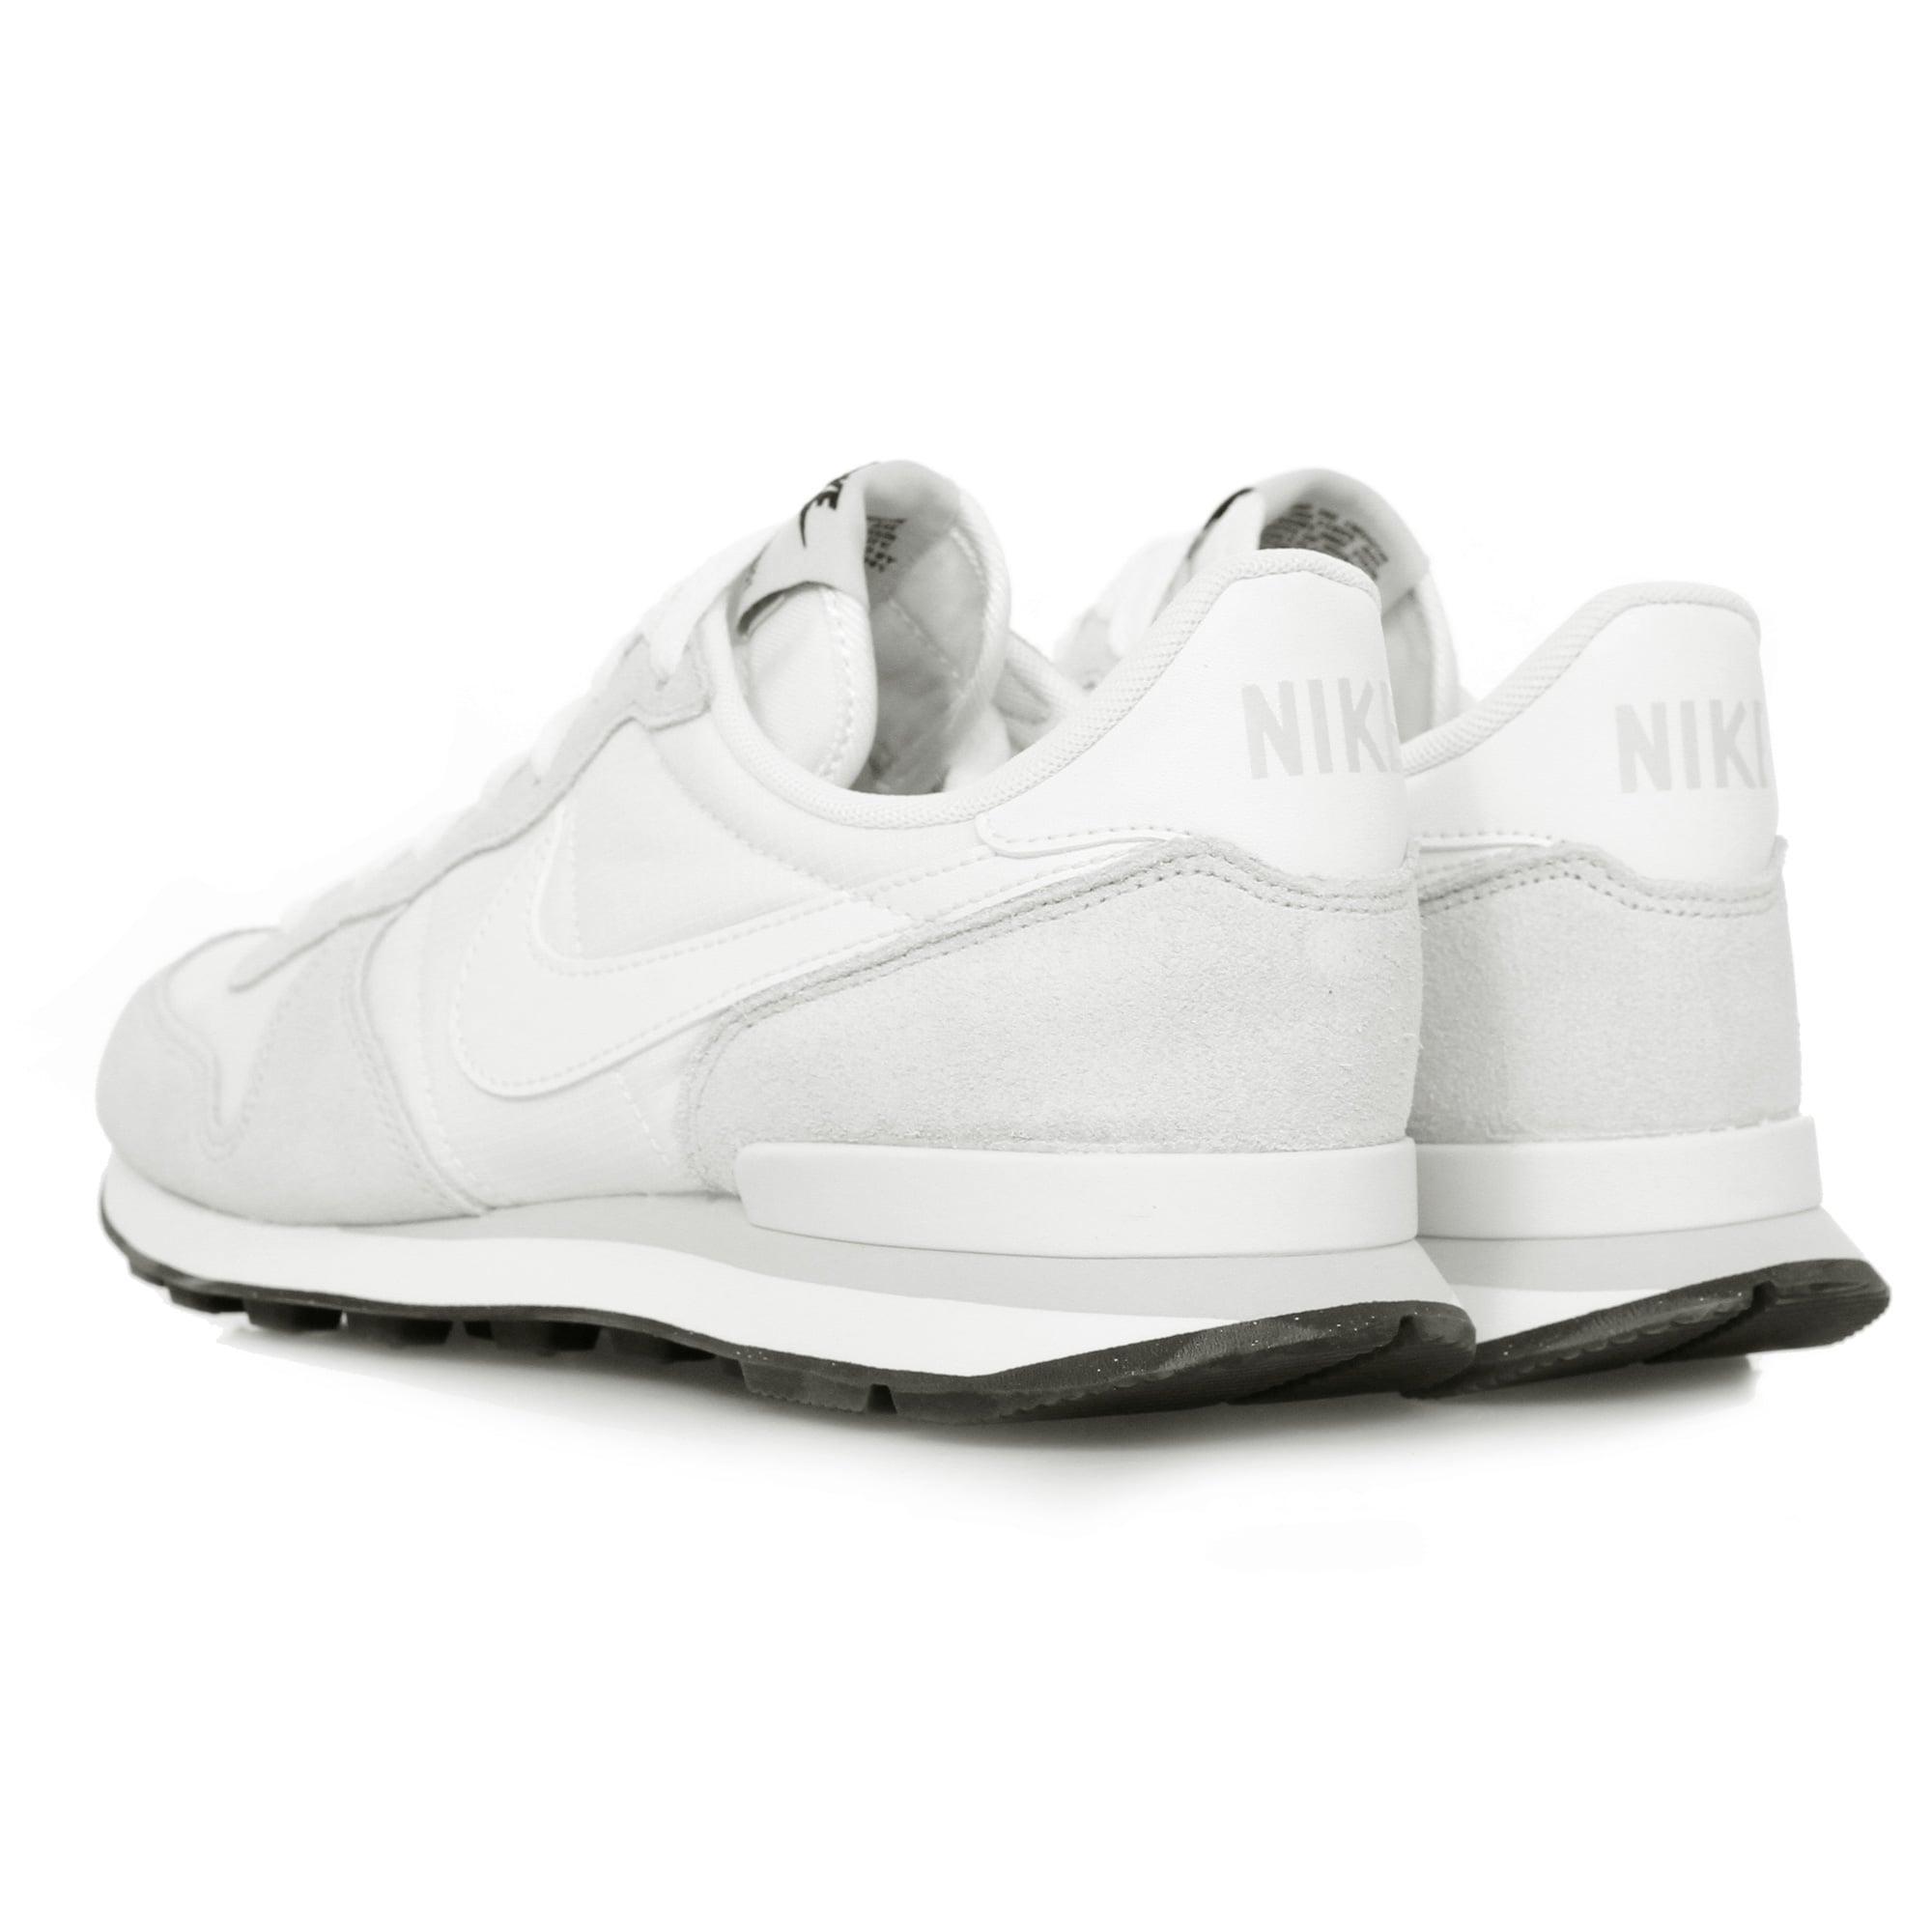 Lyst - Nike Internationalist Summit White Shoe 828041 101 in White 51c2dc386dc5